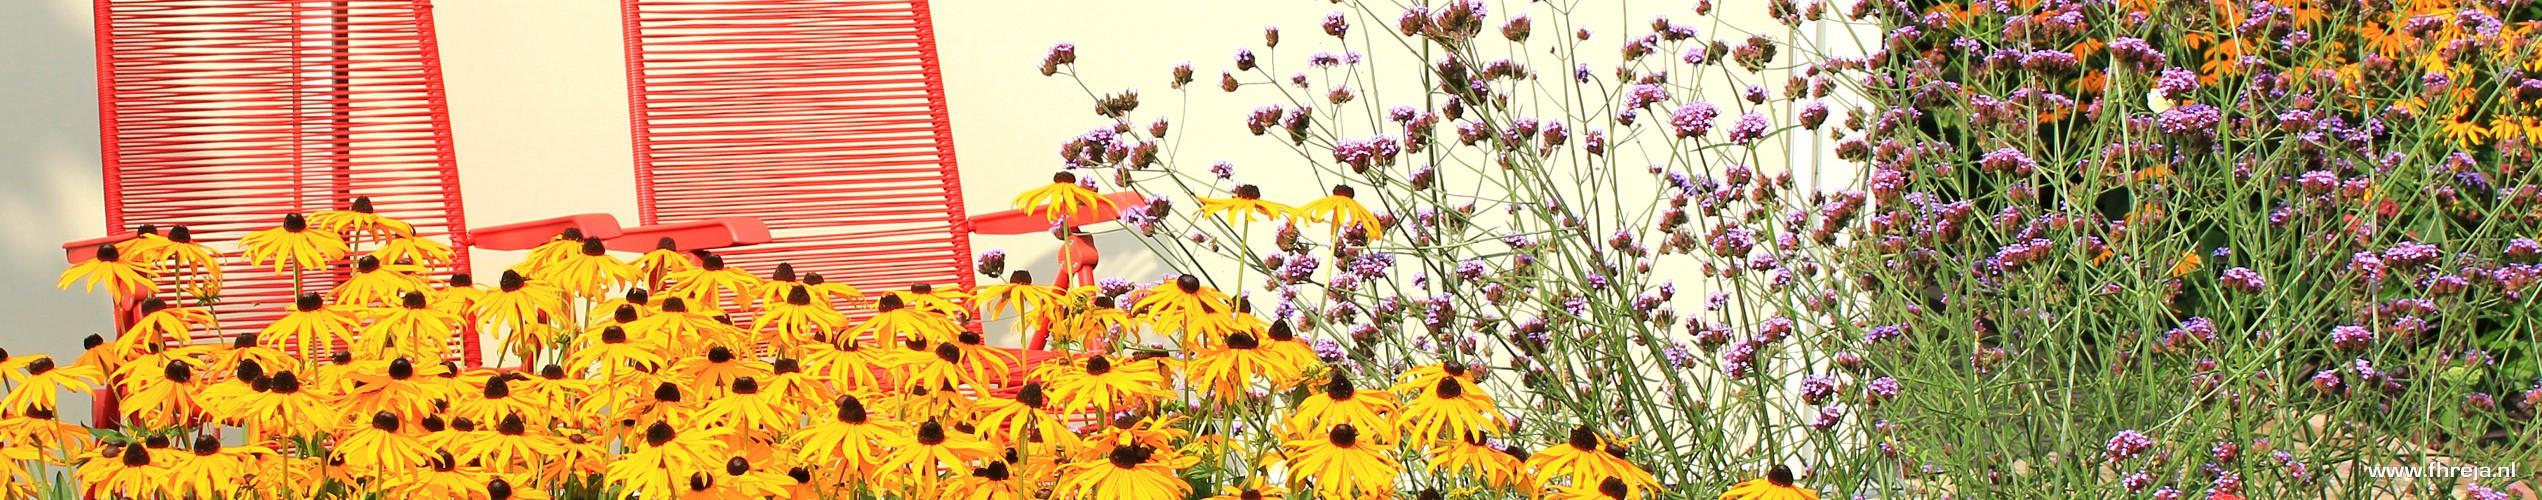 Royale kleurige tuin terras - Fhreja - Ontwerpbureau Groene Ruimte